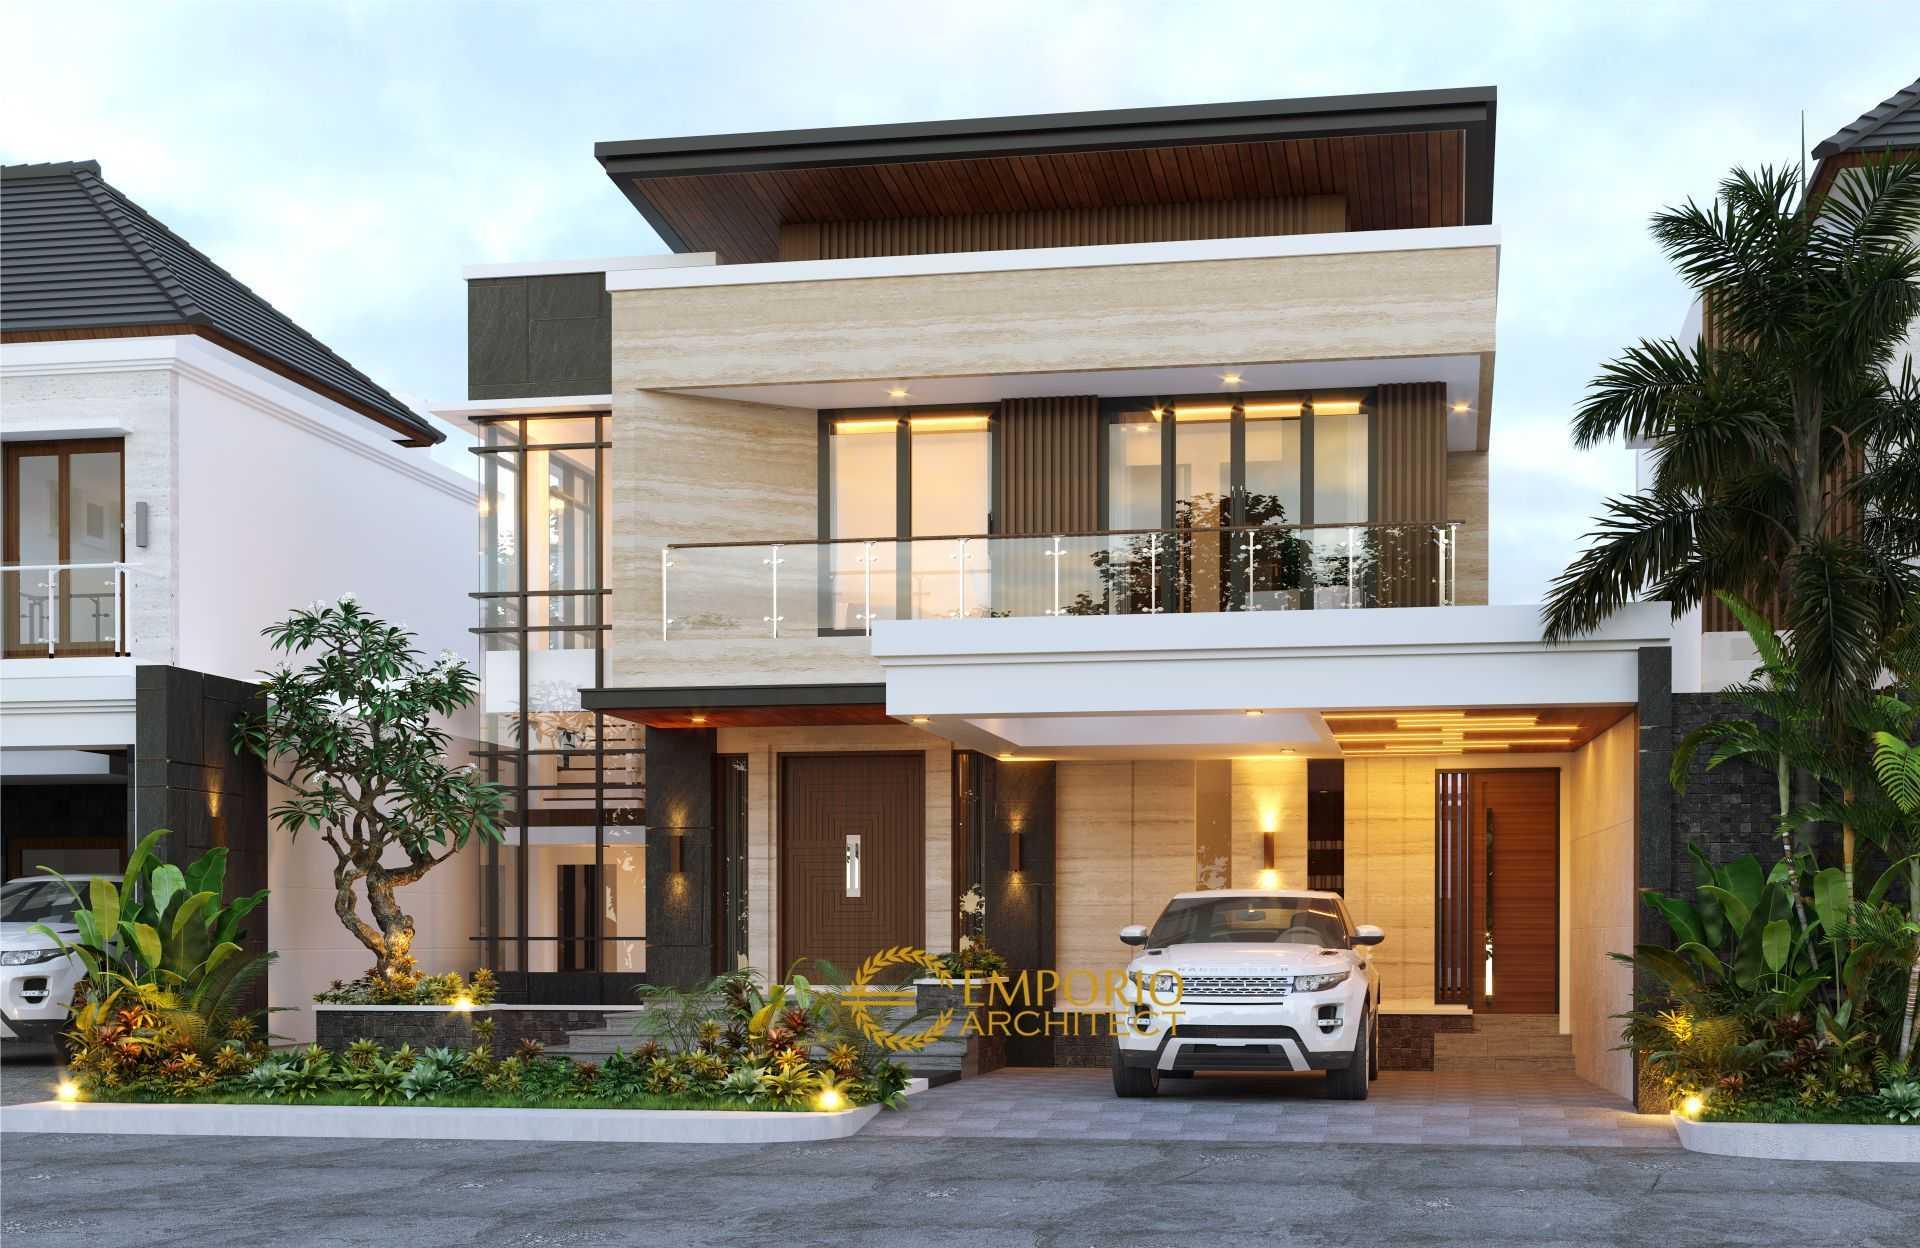 Emporio Architect Jasa Arsitek Pekanbaru Desain Rumah Modern 2 Lantai 824 Di Pekanbaru, Riau Pekanbaru, Kota Pekanbaru, Riau, Indonesia Pekanbaru, Kota Pekanbaru, Riau, Indonesia Emporio-Architect-Jasa-Arsitek-Pekanbaru-Desain-Rumah-Modern-2-Lantai-824-Di-Pekanbaru-Riau Modern 94131